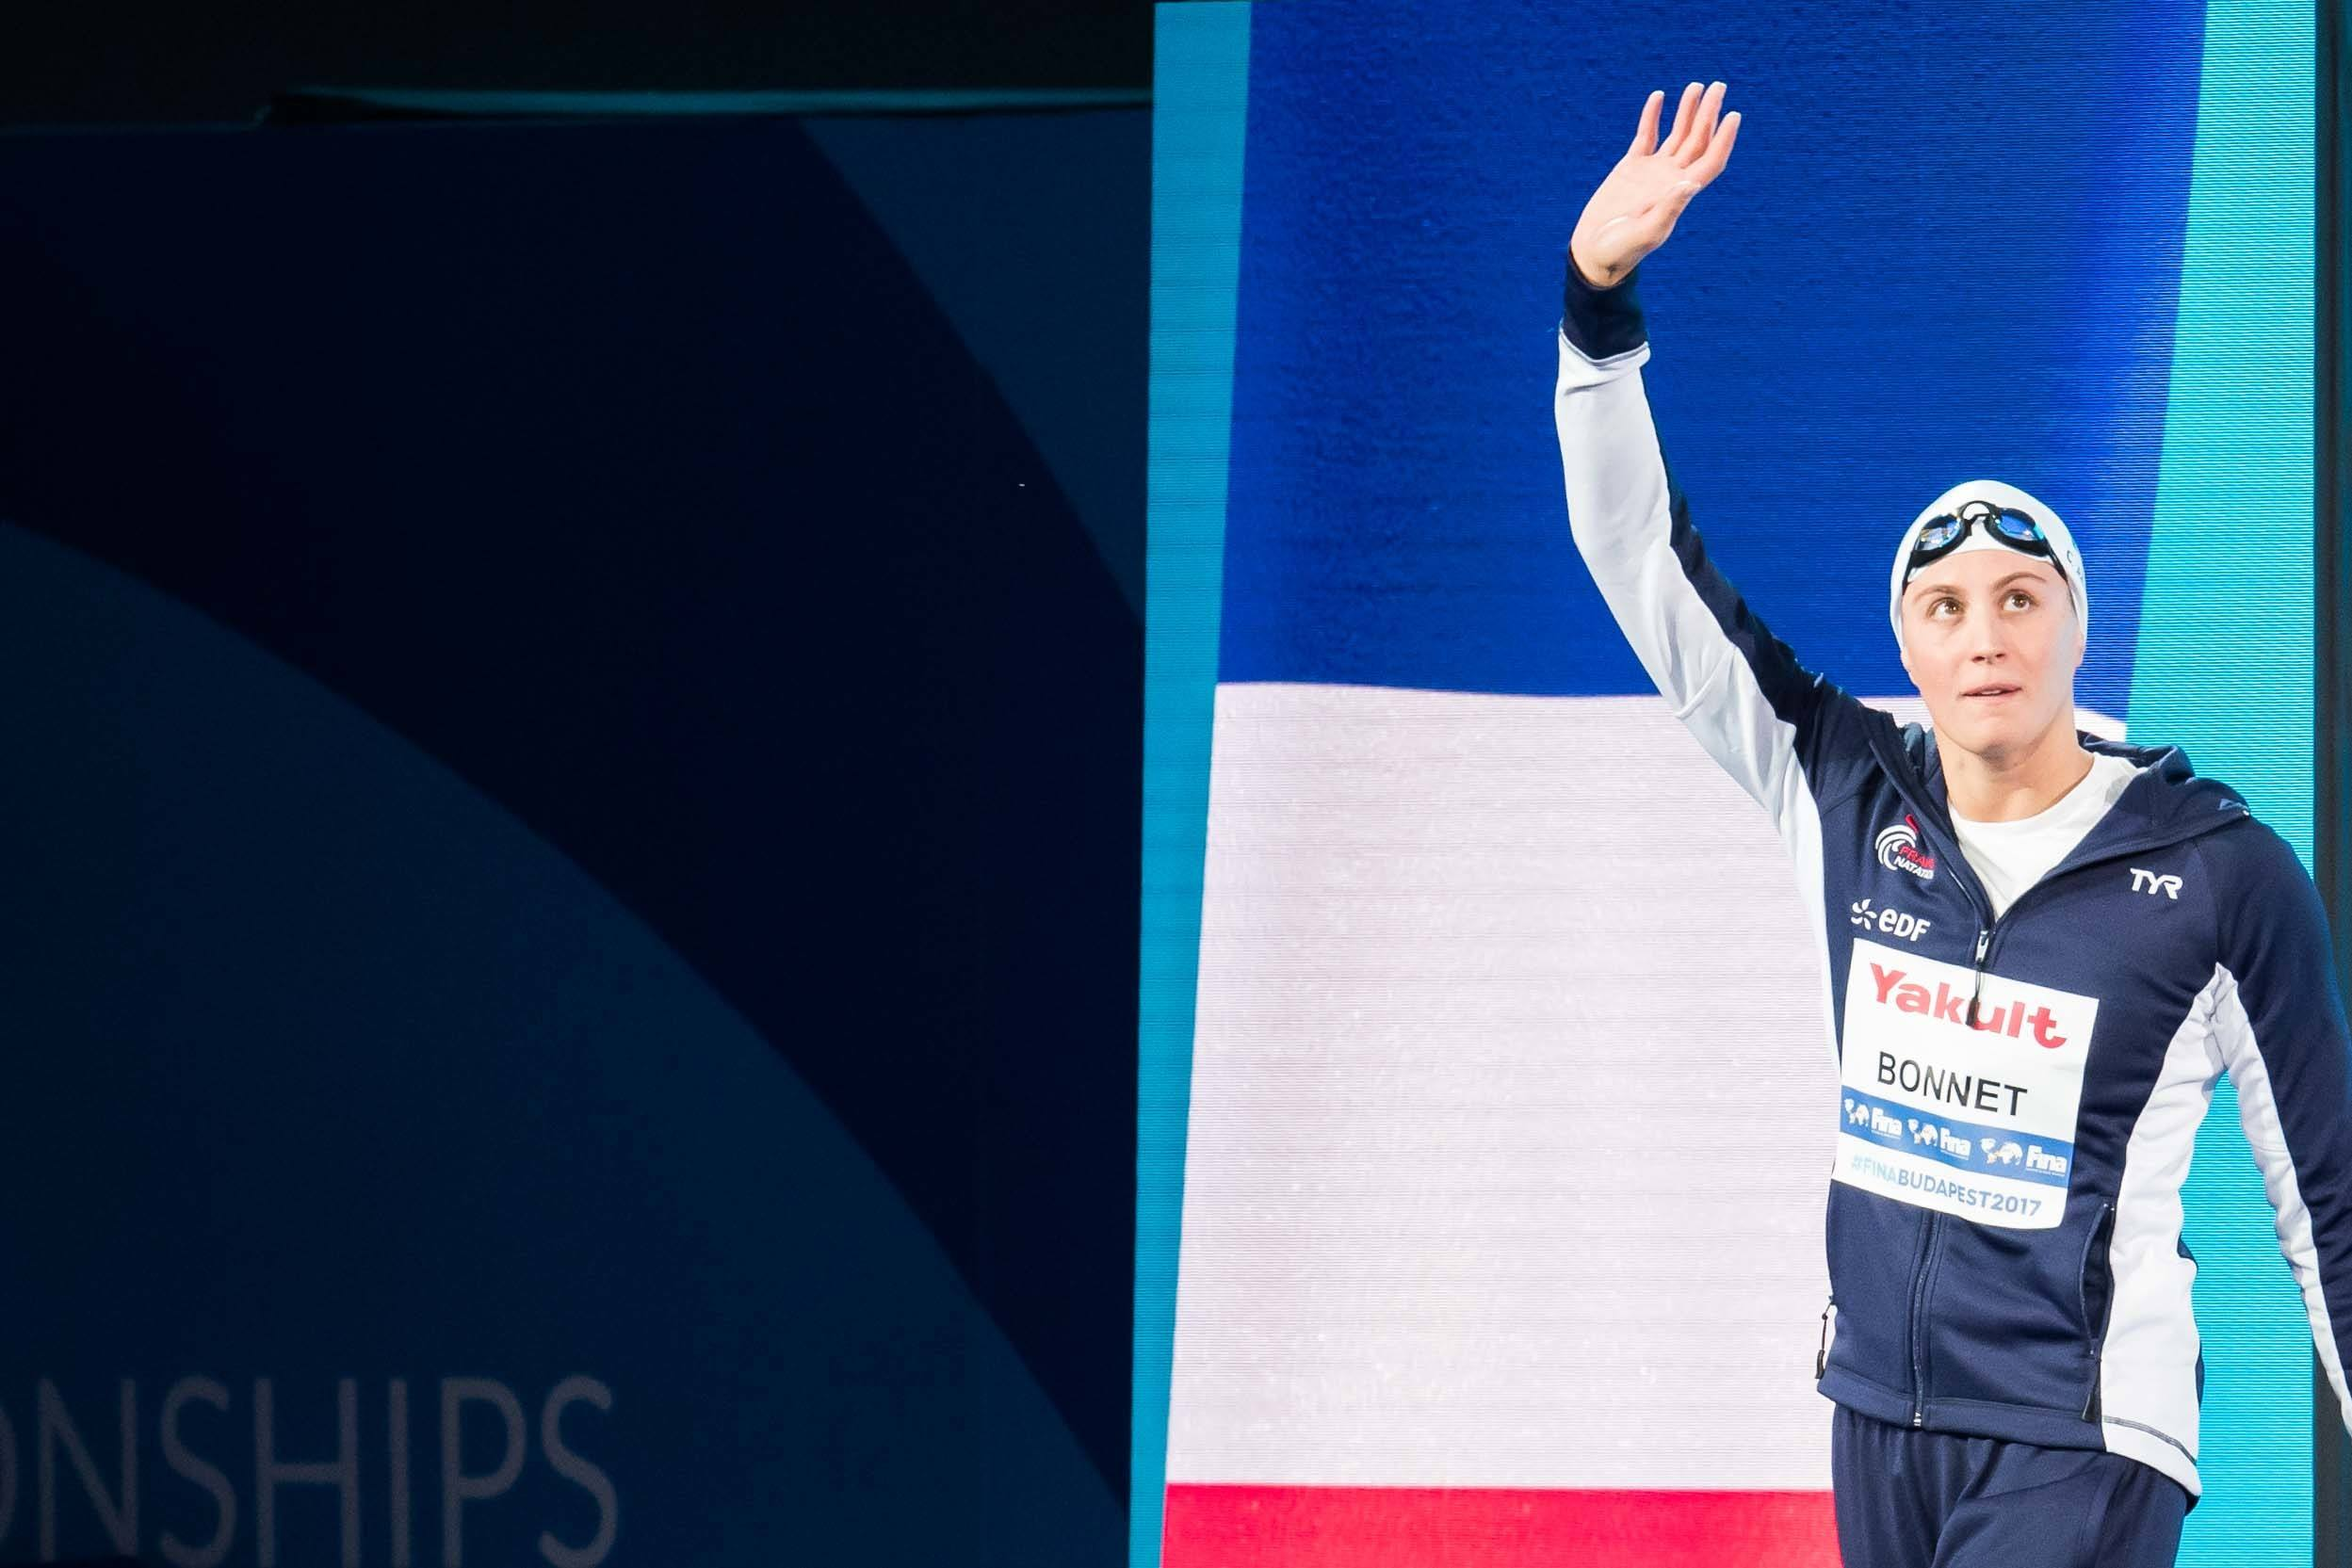 Charlotte Bonnet Championne D Europe